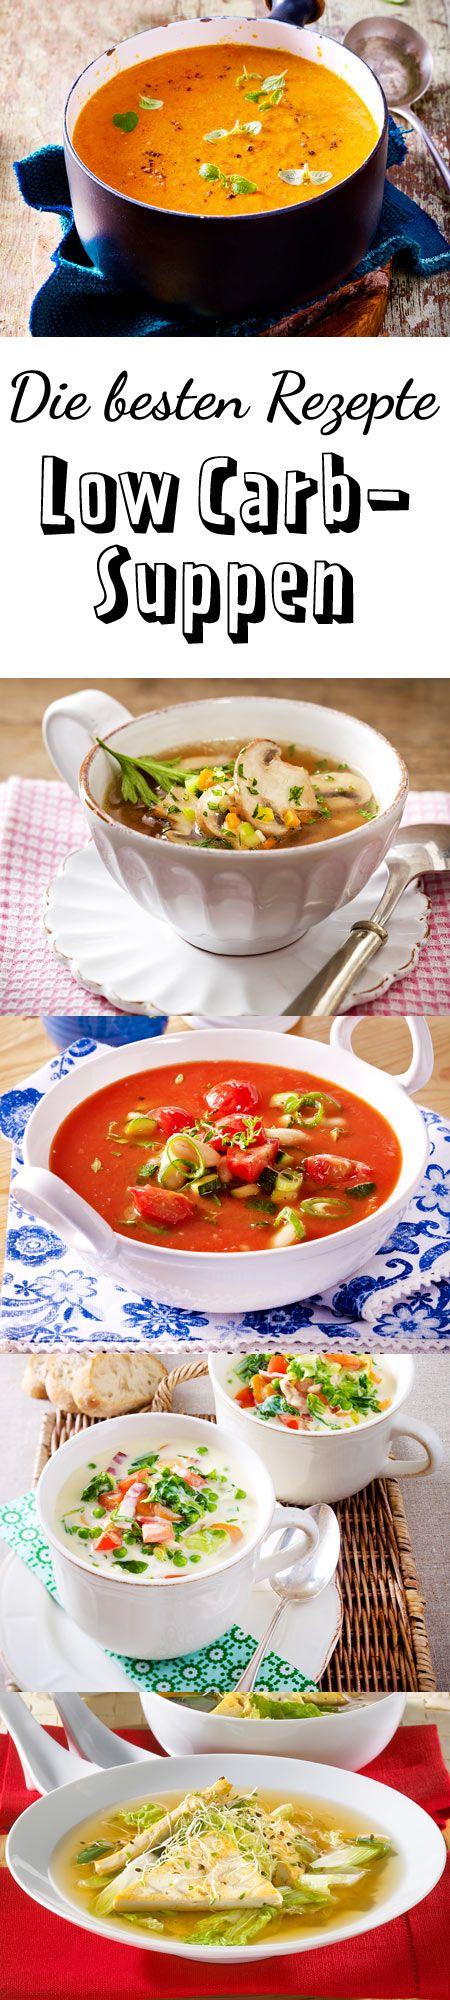 low carb suppe die besten rezepte low carb rezepte pinterest suppen low carb suppe und. Black Bedroom Furniture Sets. Home Design Ideas